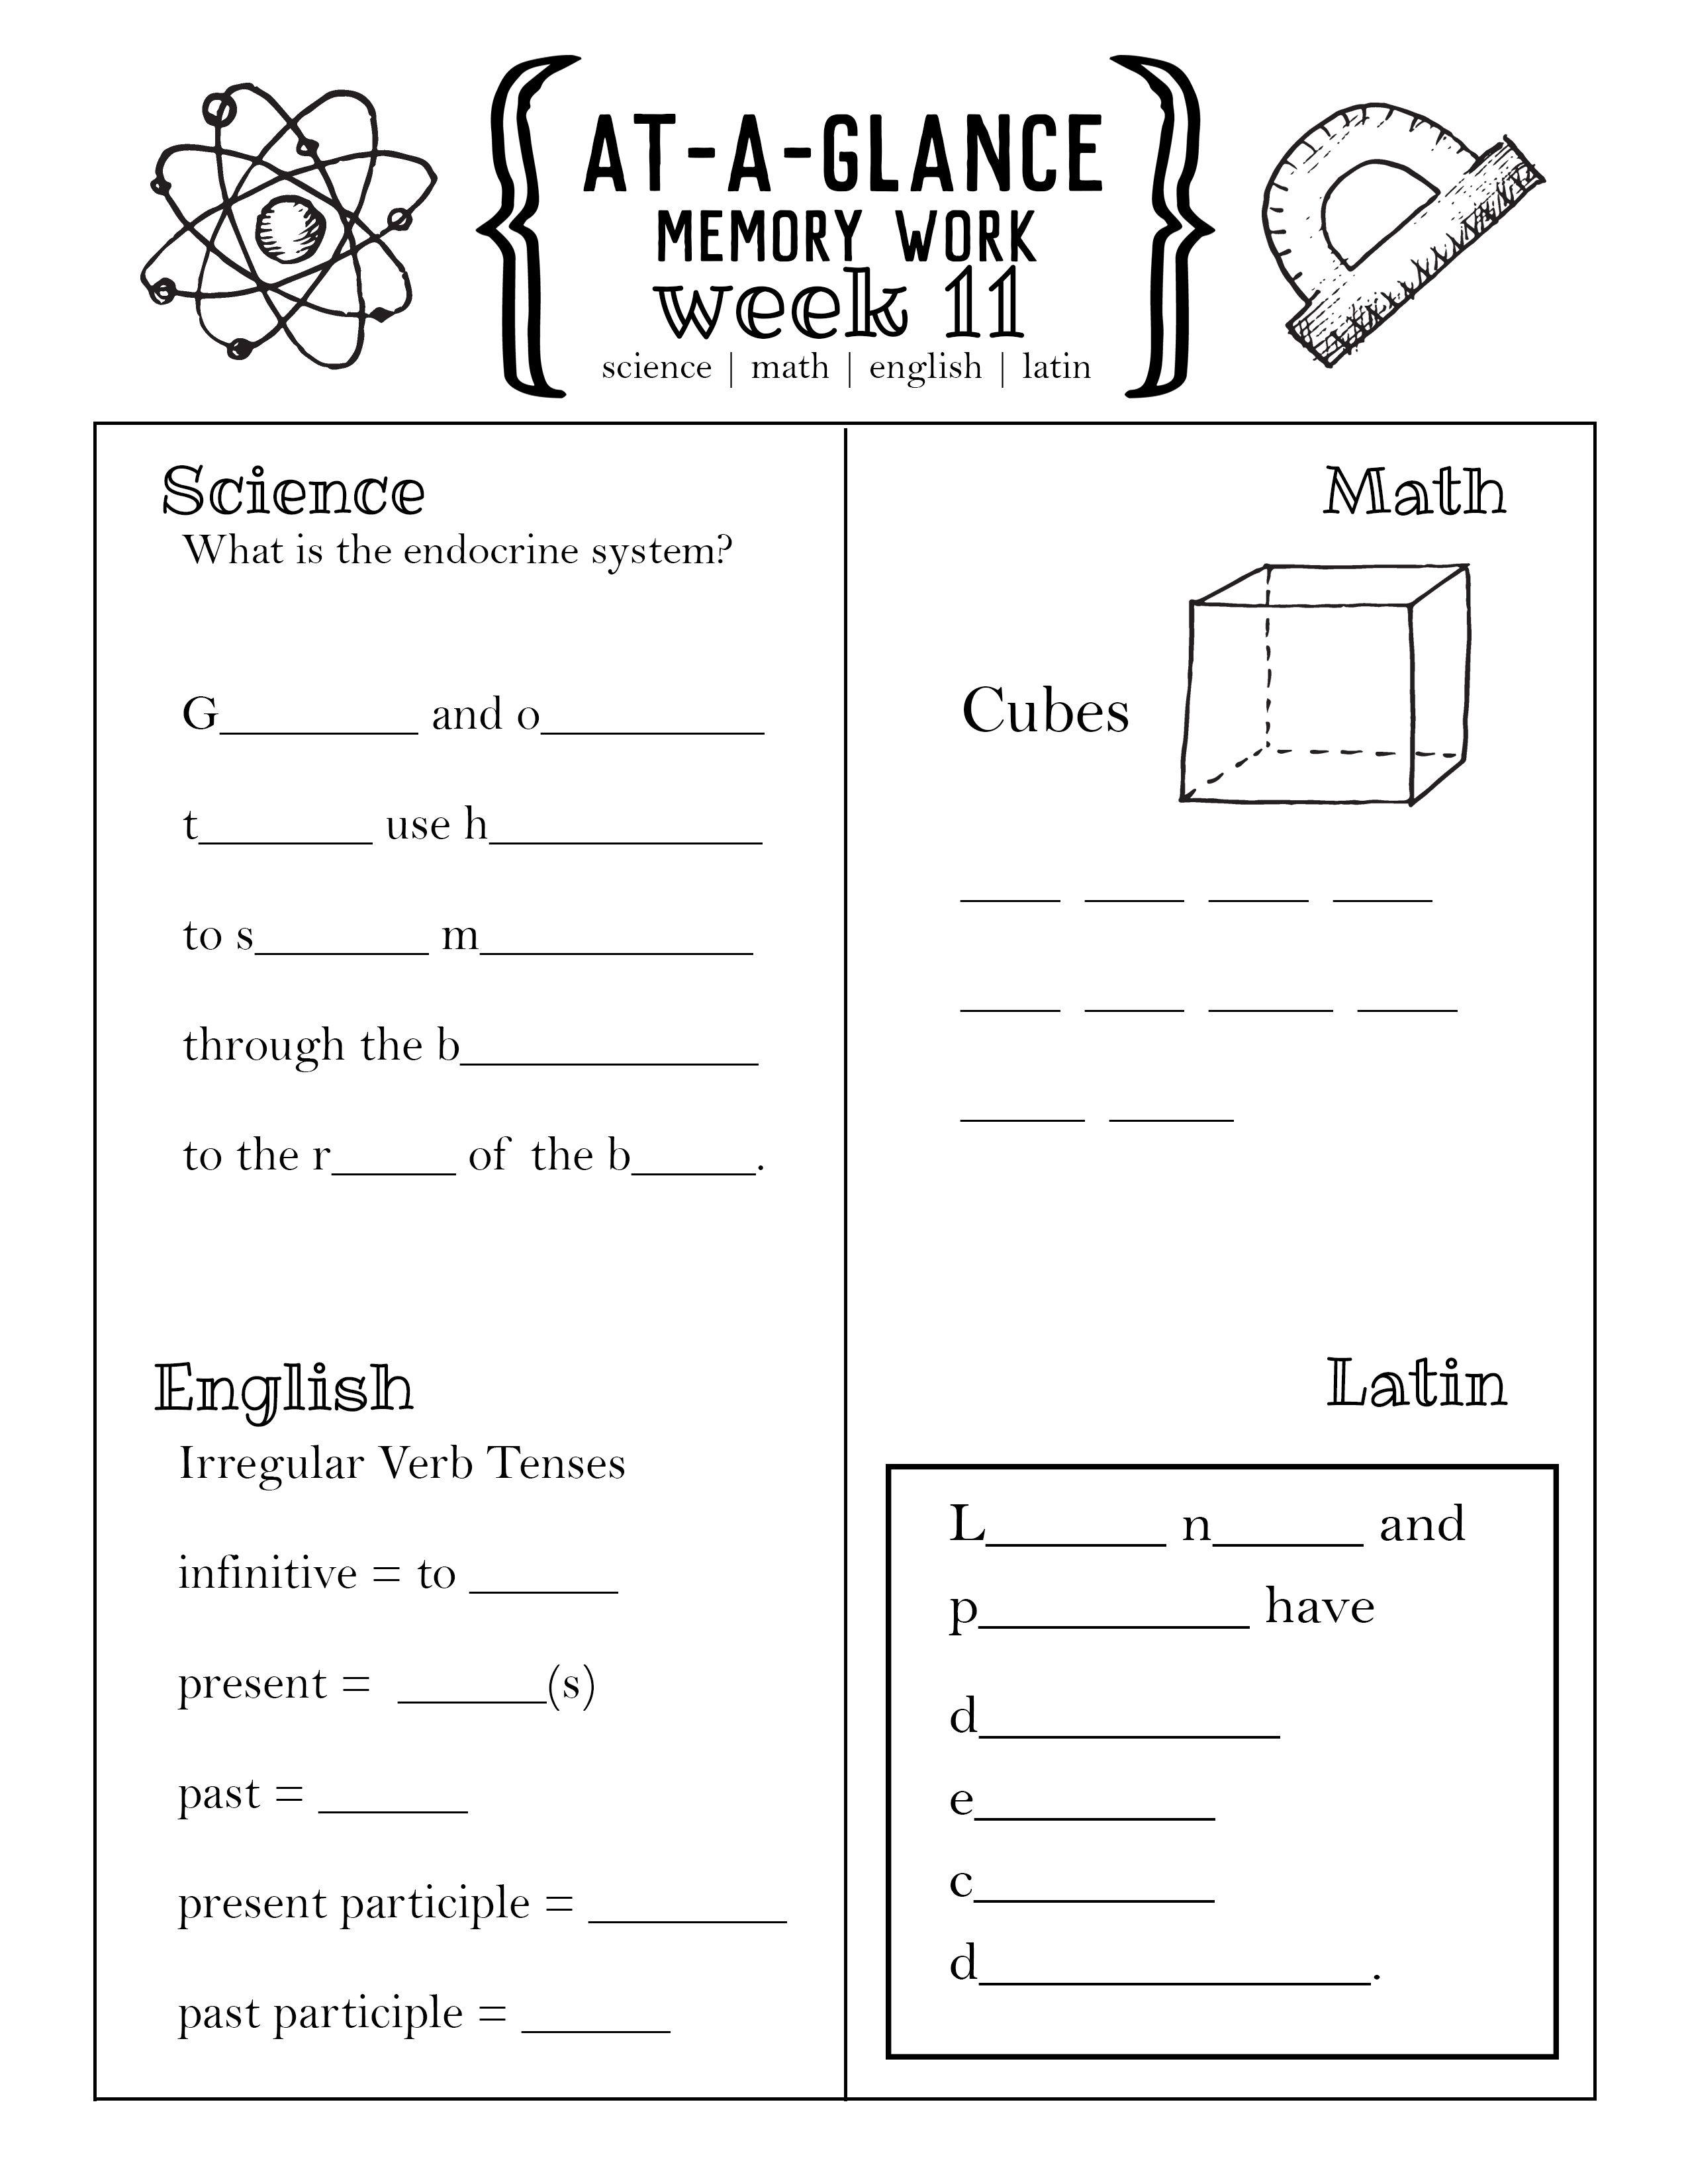 Cycle 3 At-A-Glance Memory Worksheets PDF   Kindergarten worksheets [ 3300 x 2550 Pixel ]